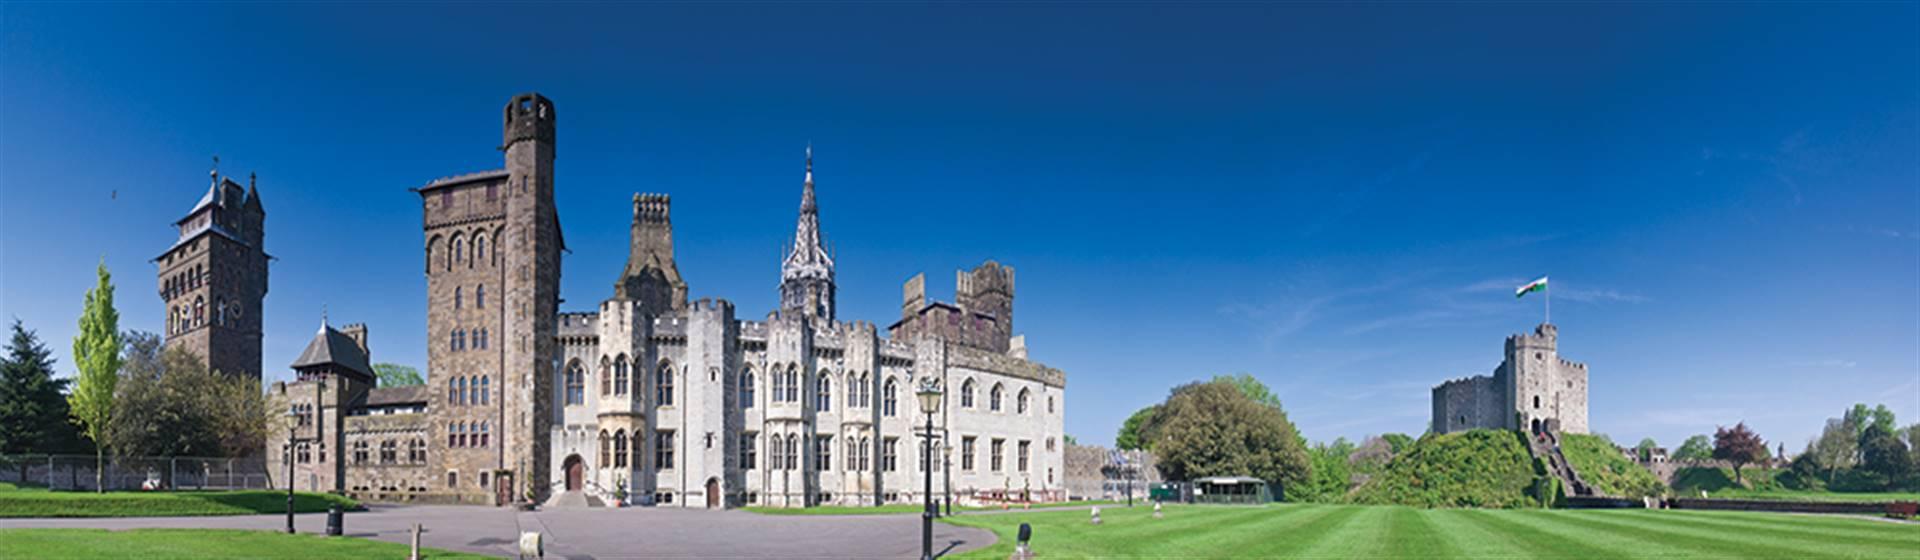 Mint & Malt: The Royal Mint Experience Cardiff